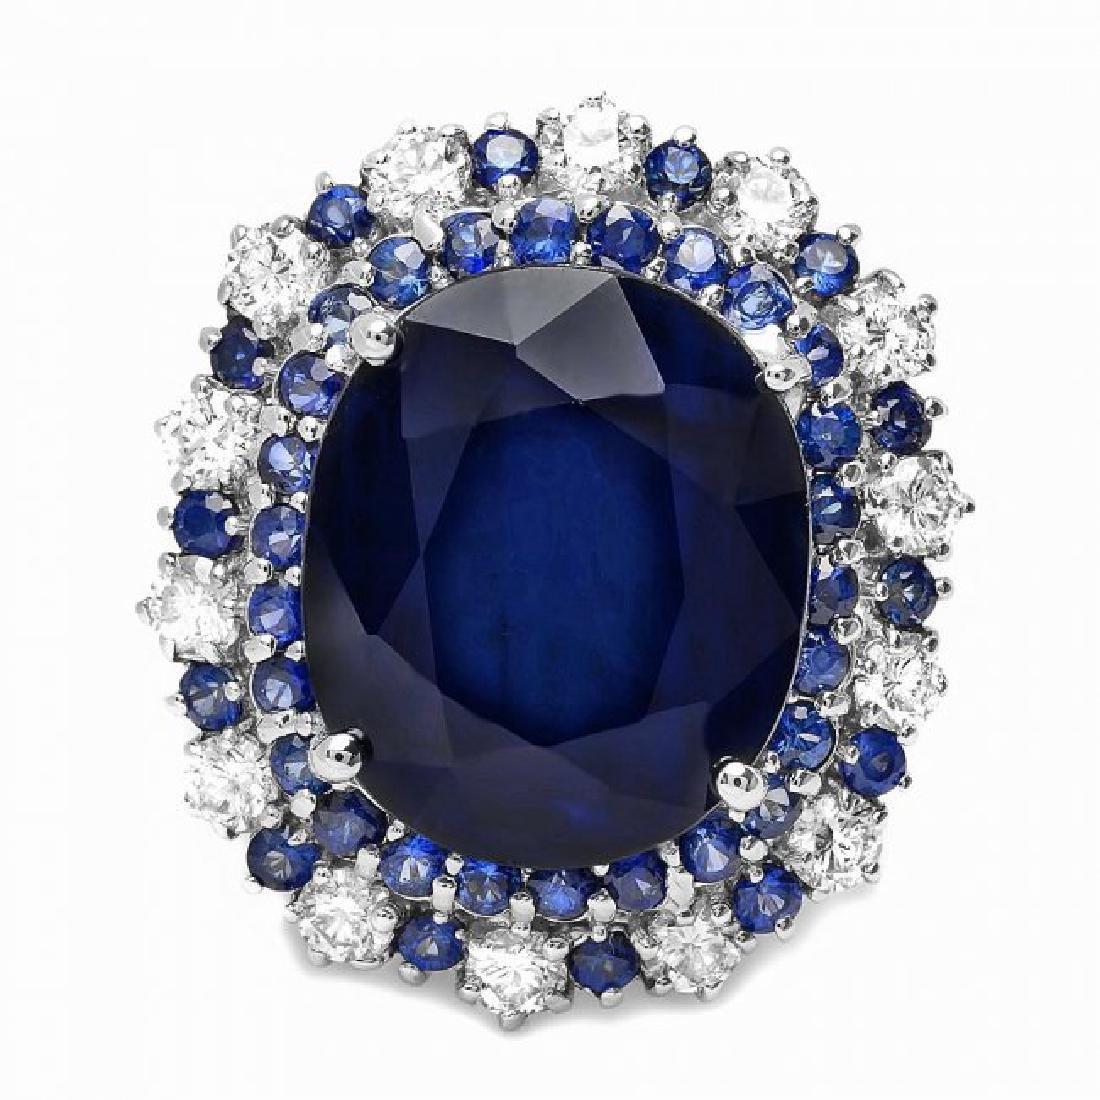 14k Gold 16.4ct Sapphire 1.00ct Diamond Ring - 2